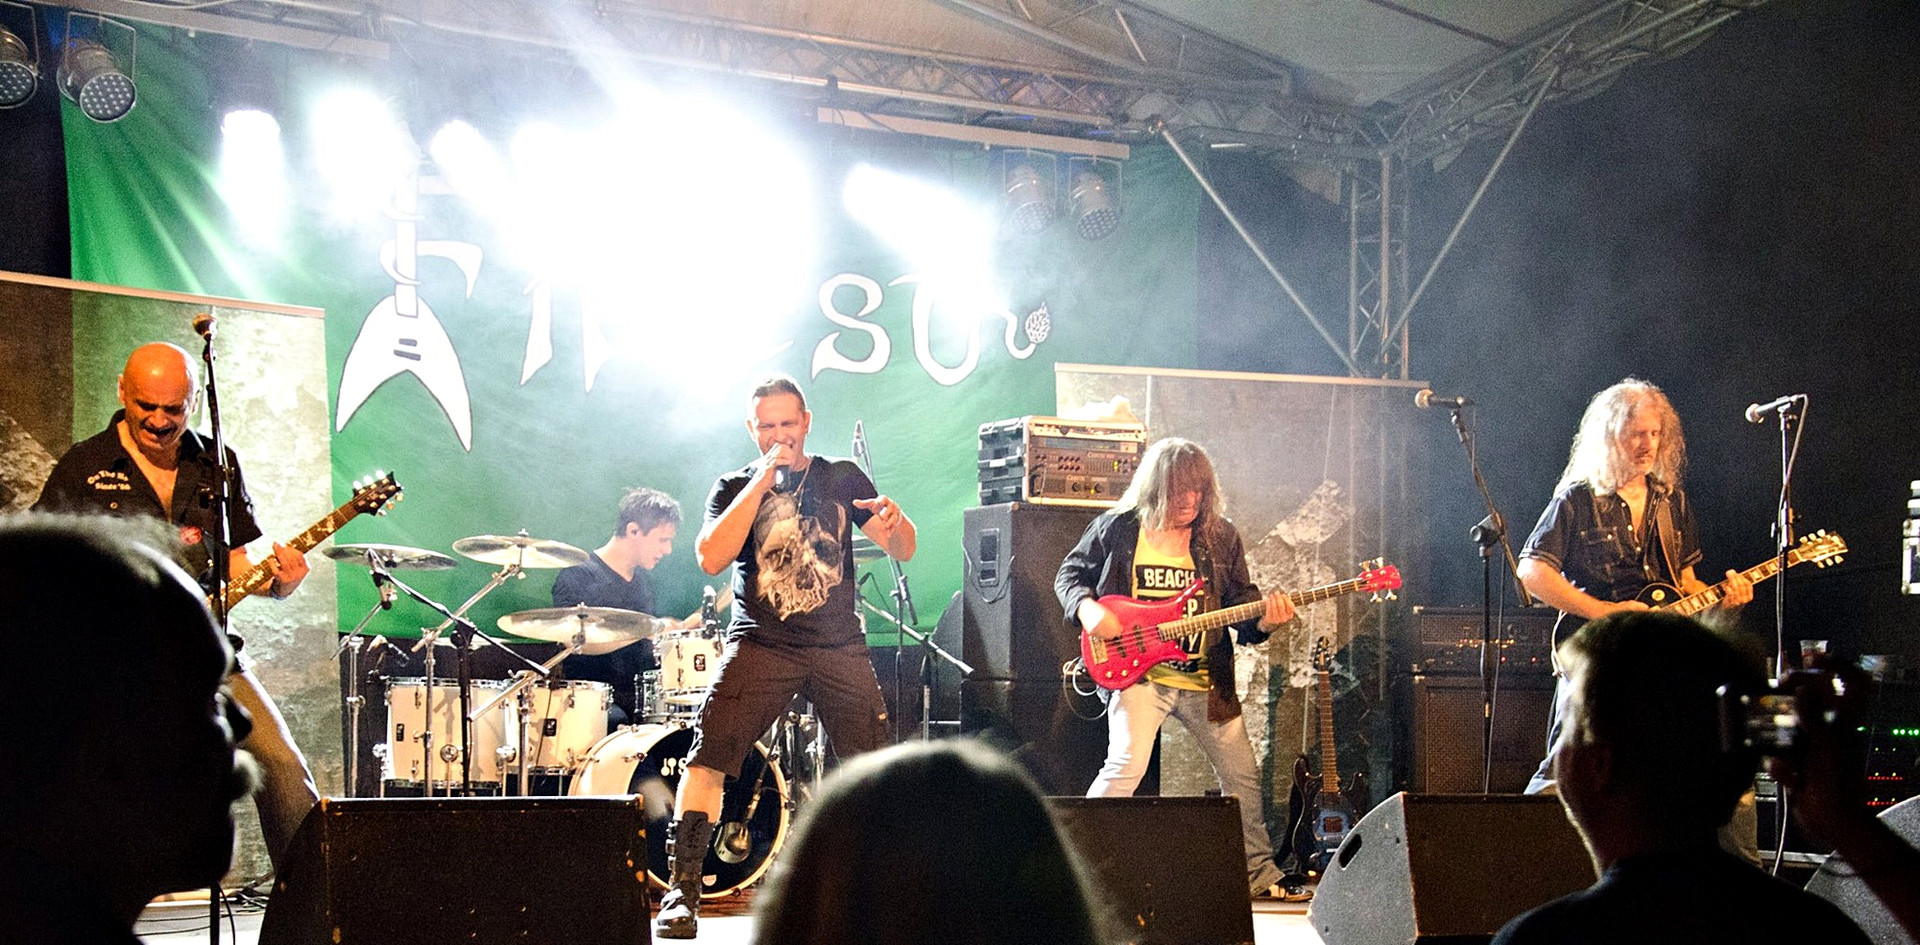 Ústí nad Labem, Fírfest 2016